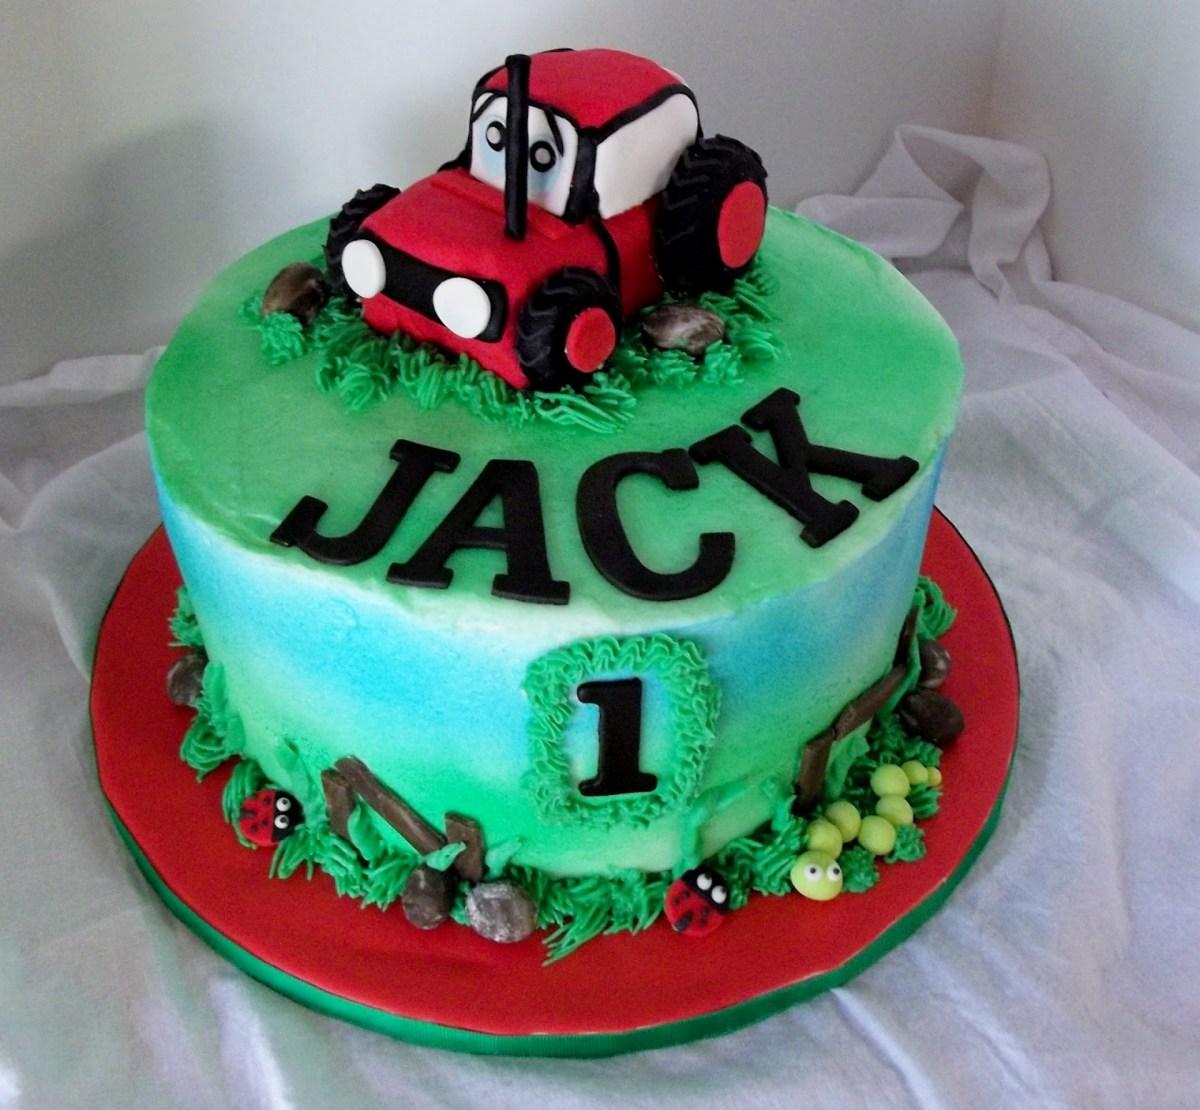 Astounding Tractor Birthday Cakes Tractor Birthday Cakes Farmer Impressive Personalised Birthday Cards Beptaeletsinfo